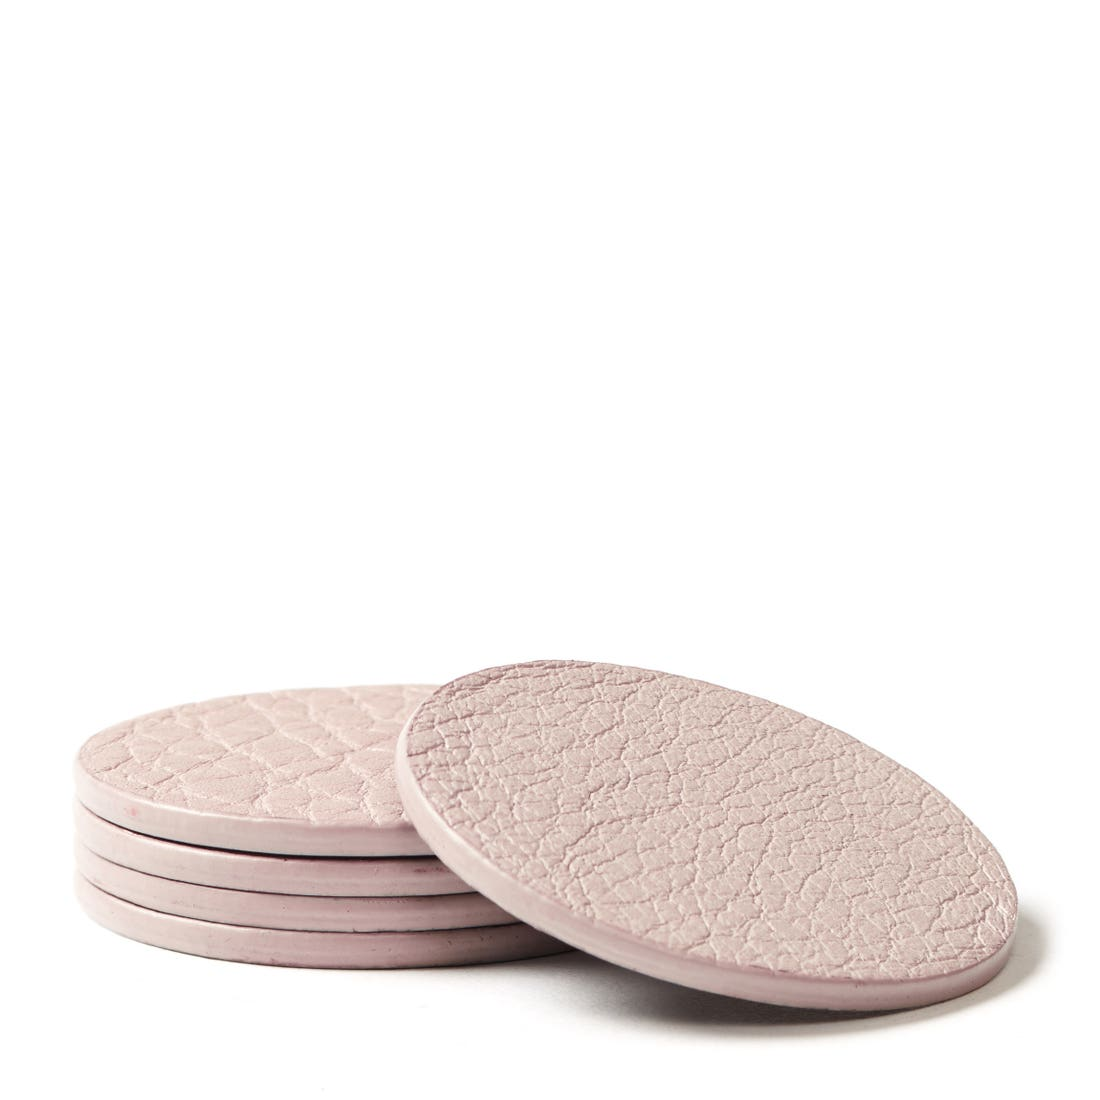 Large Circle Magnets